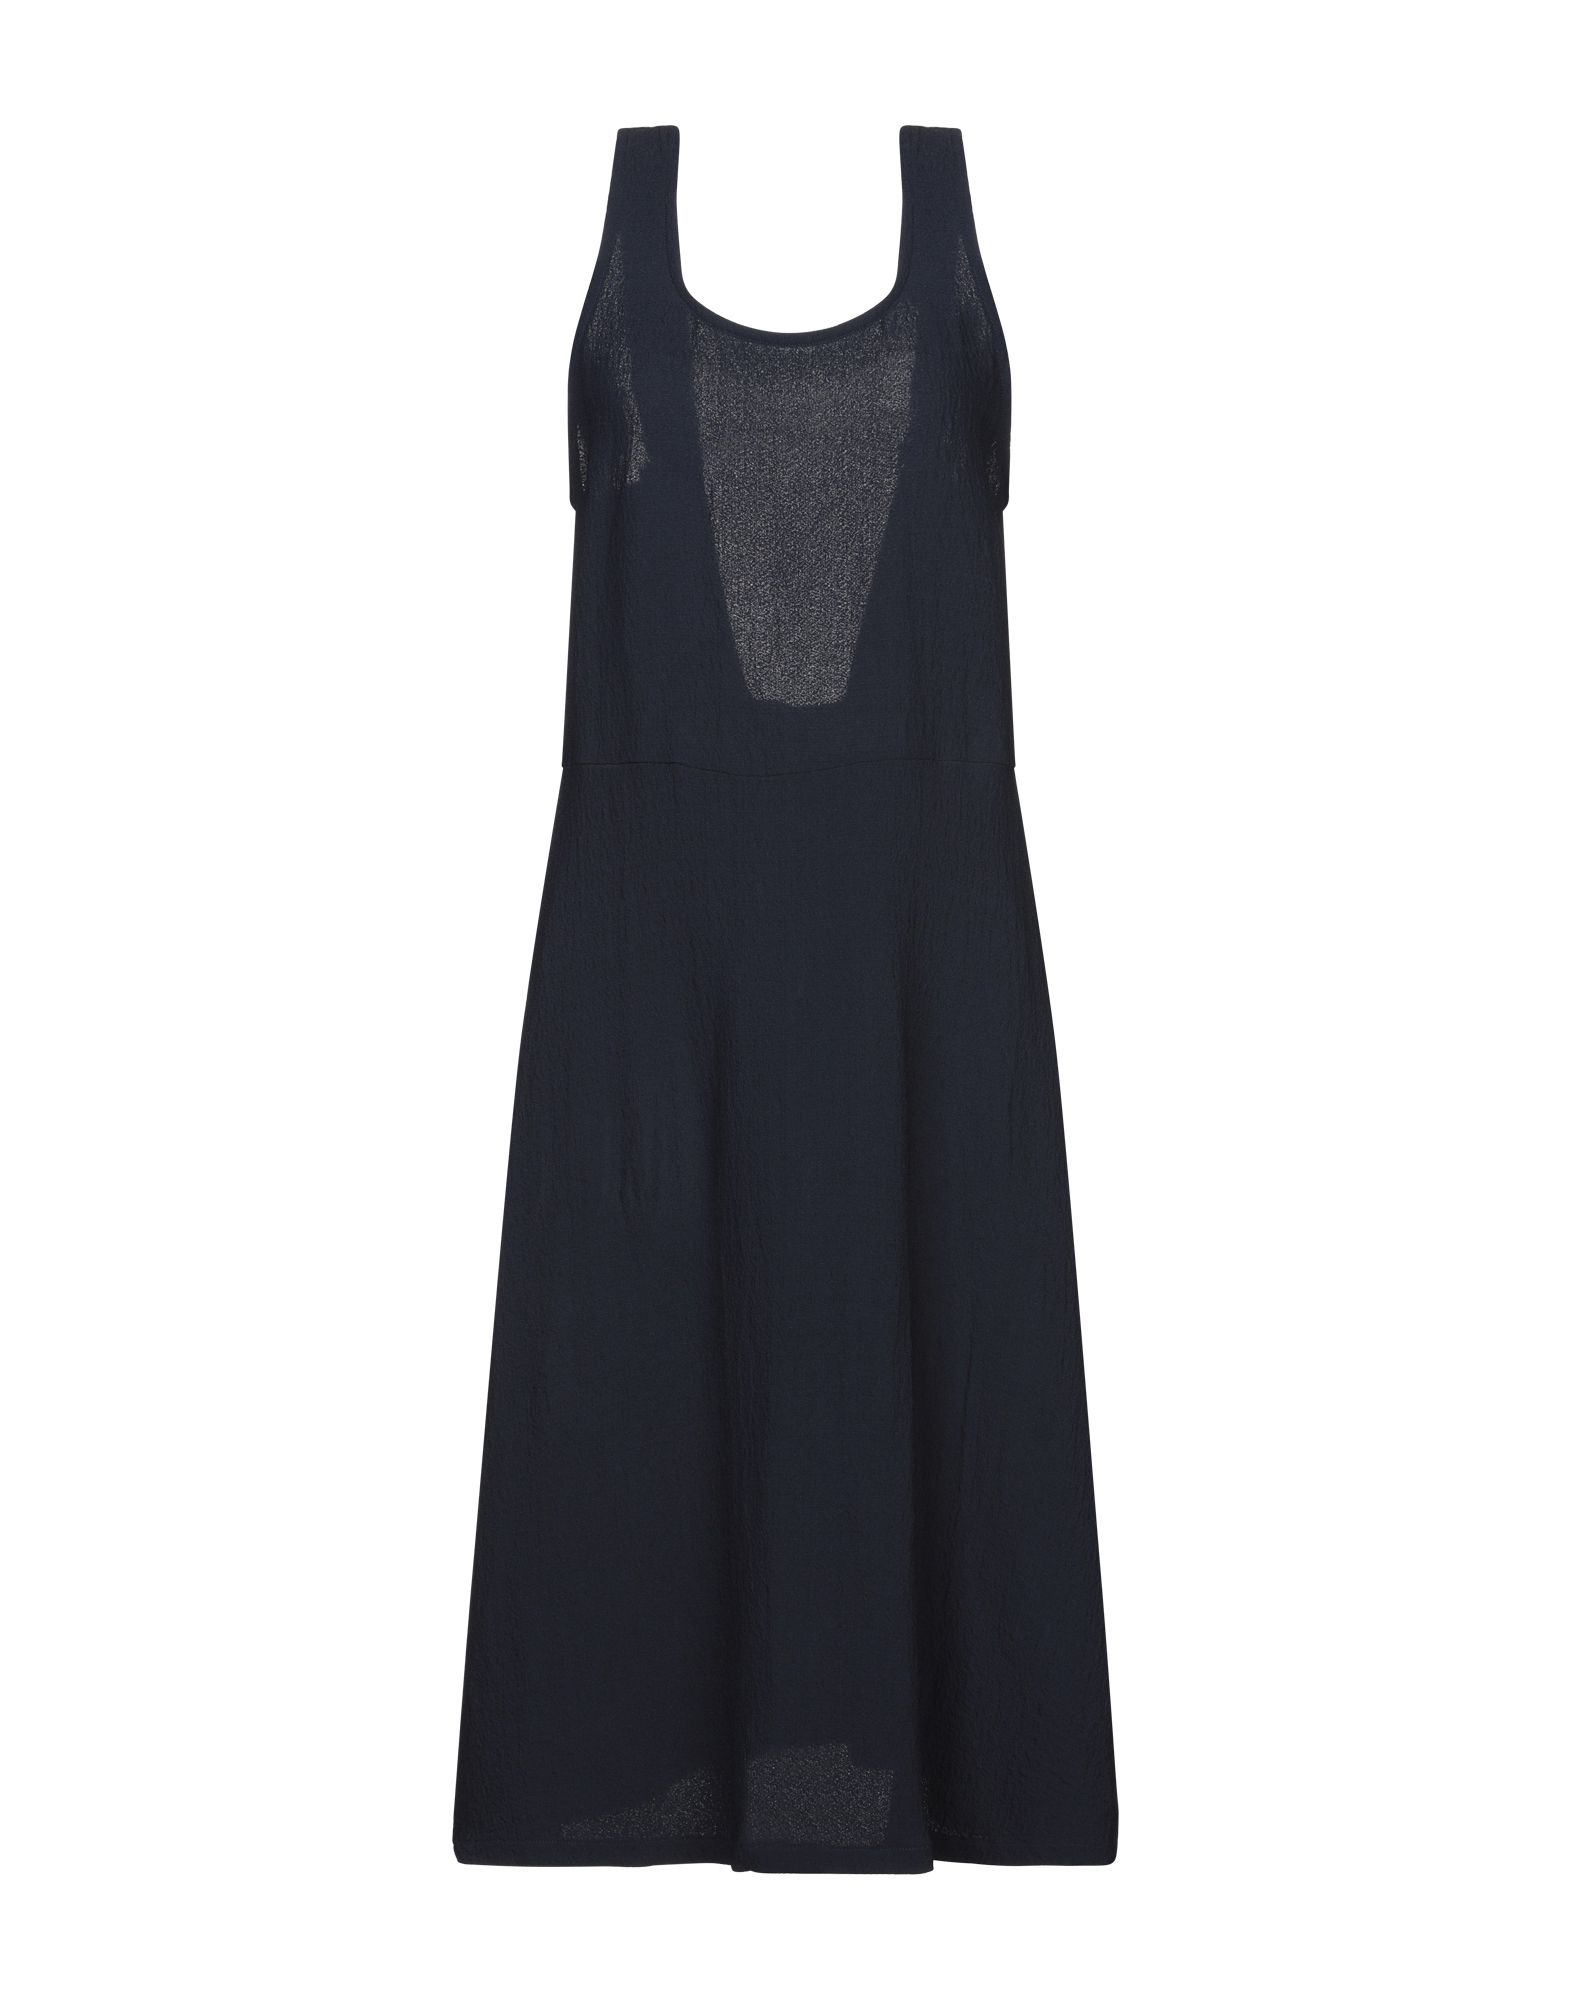 SITA MURT/ Платье до колена